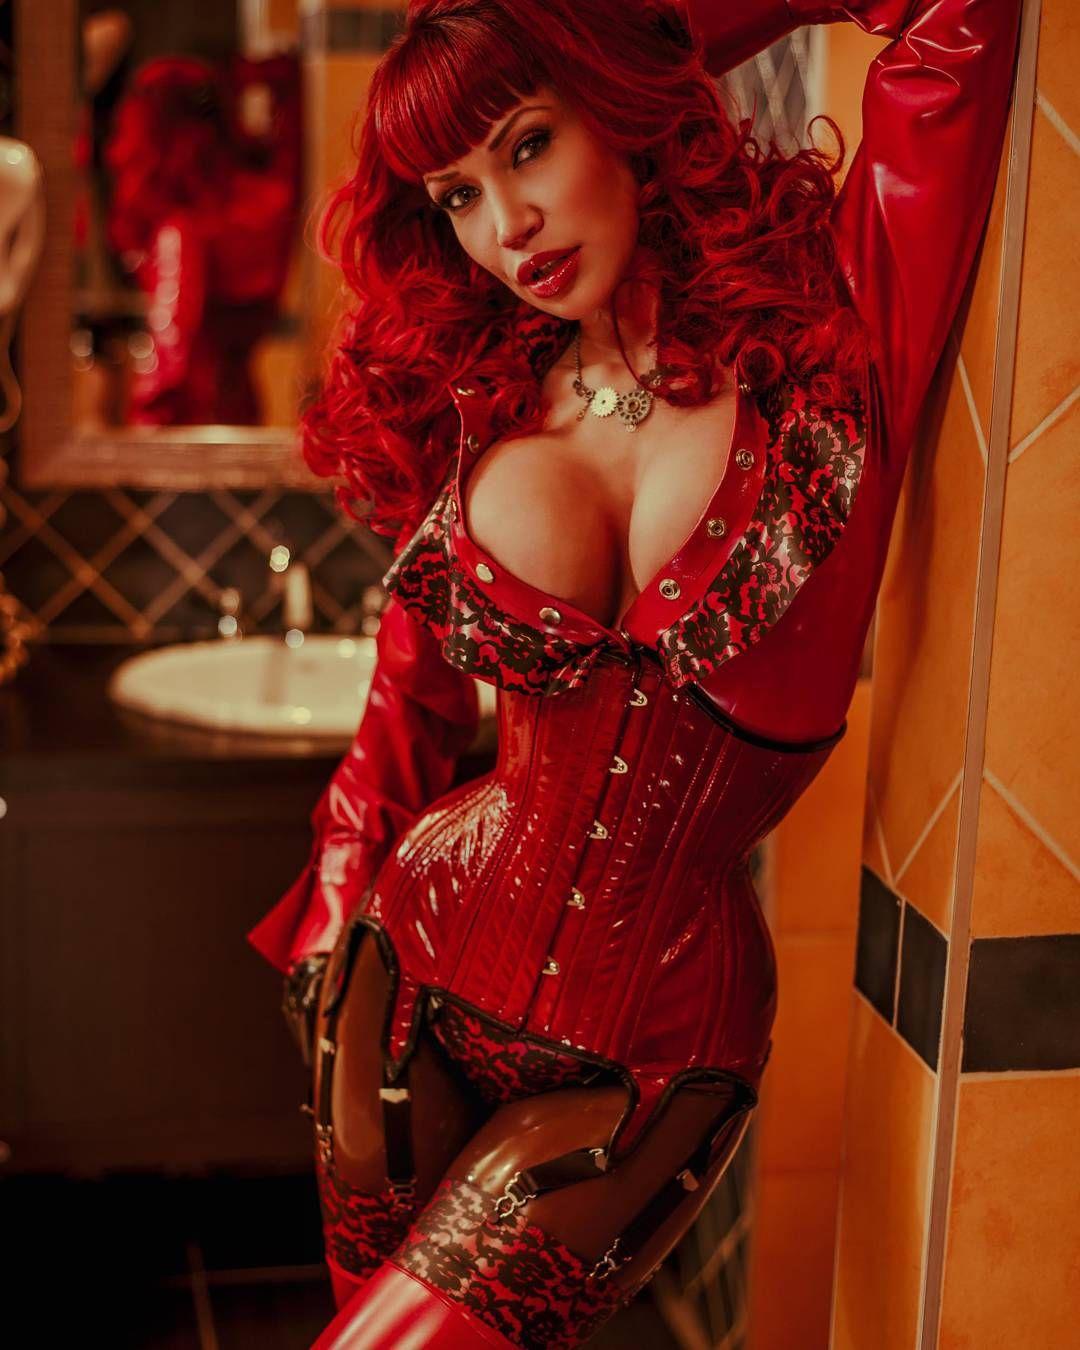 Hot redhead plaid corset